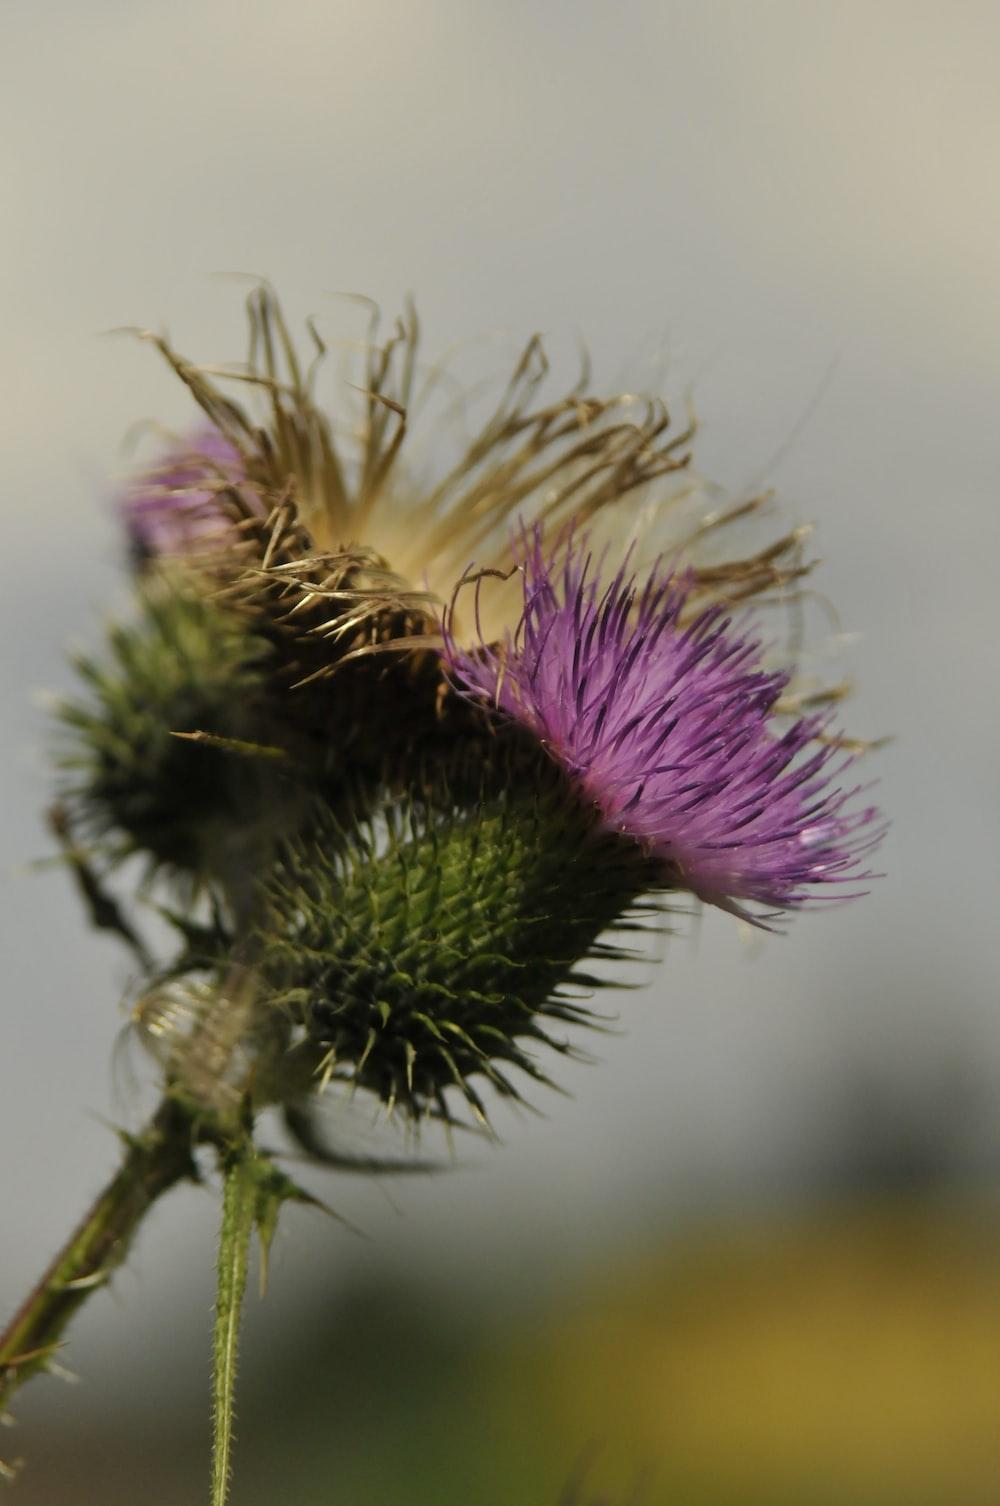 pink and green flower in tilt shift lens